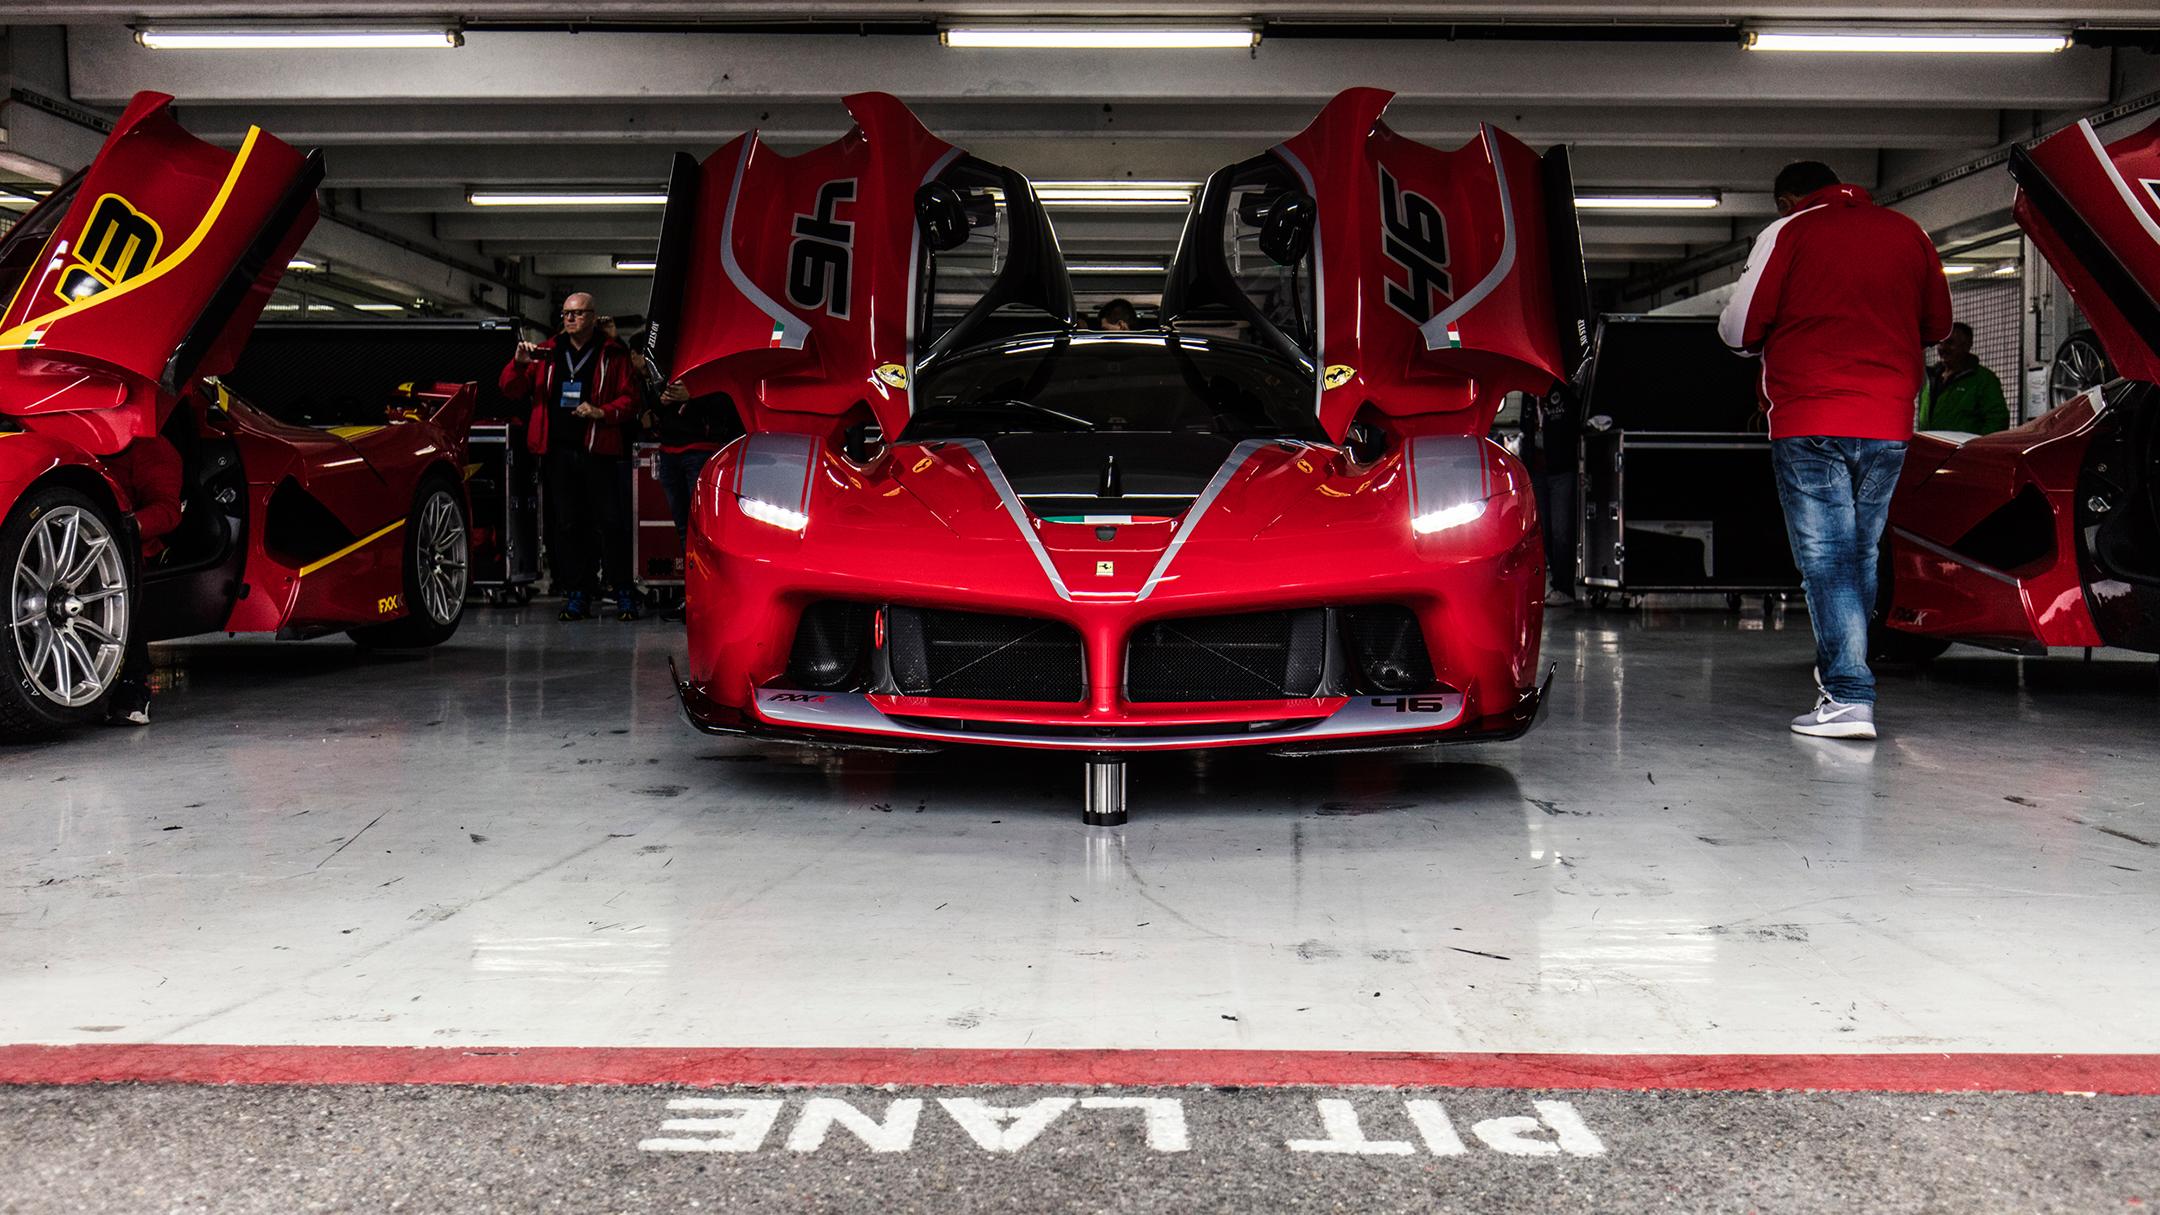 Ferrari FXX K - 2017 - pit-lane - Hockenheim circuit - Ferrari 70 anniversary